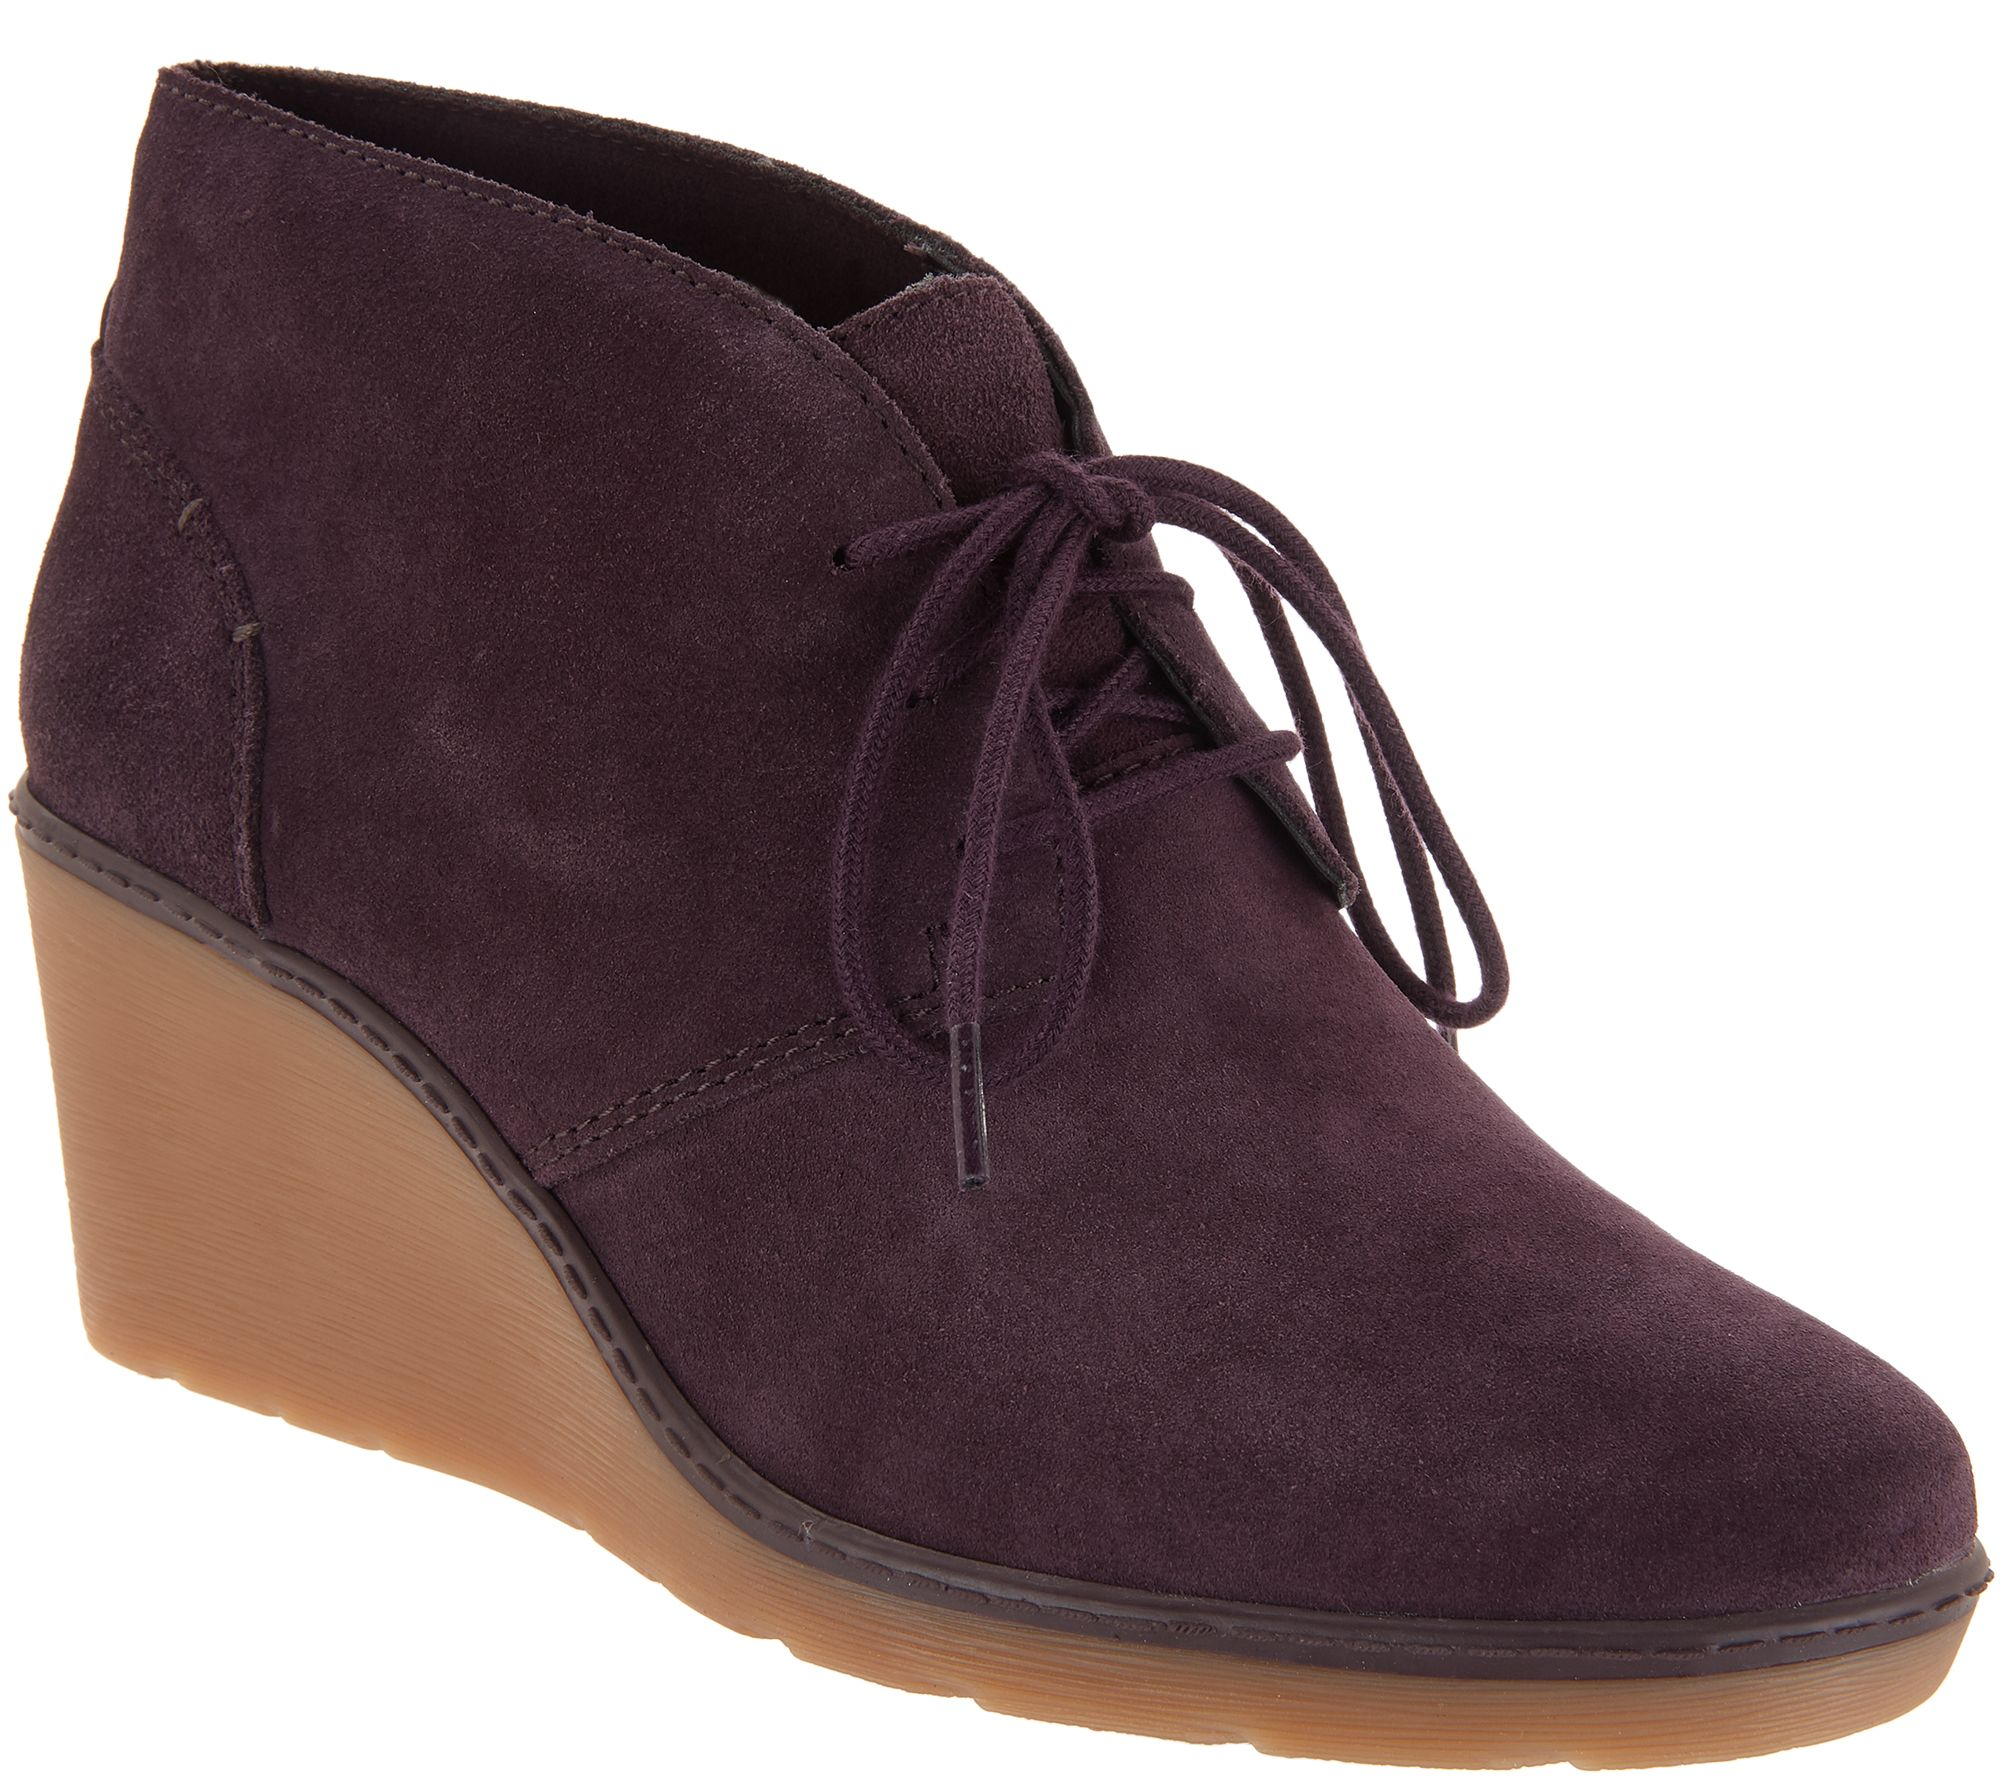 neumático Cantidad de Moviente  Men Clarks CLARKS Mens Grandin Mid Chukka Boot 08 Pick SZ/Color. Clothing,  Shoes & Accessories vishawatch.com